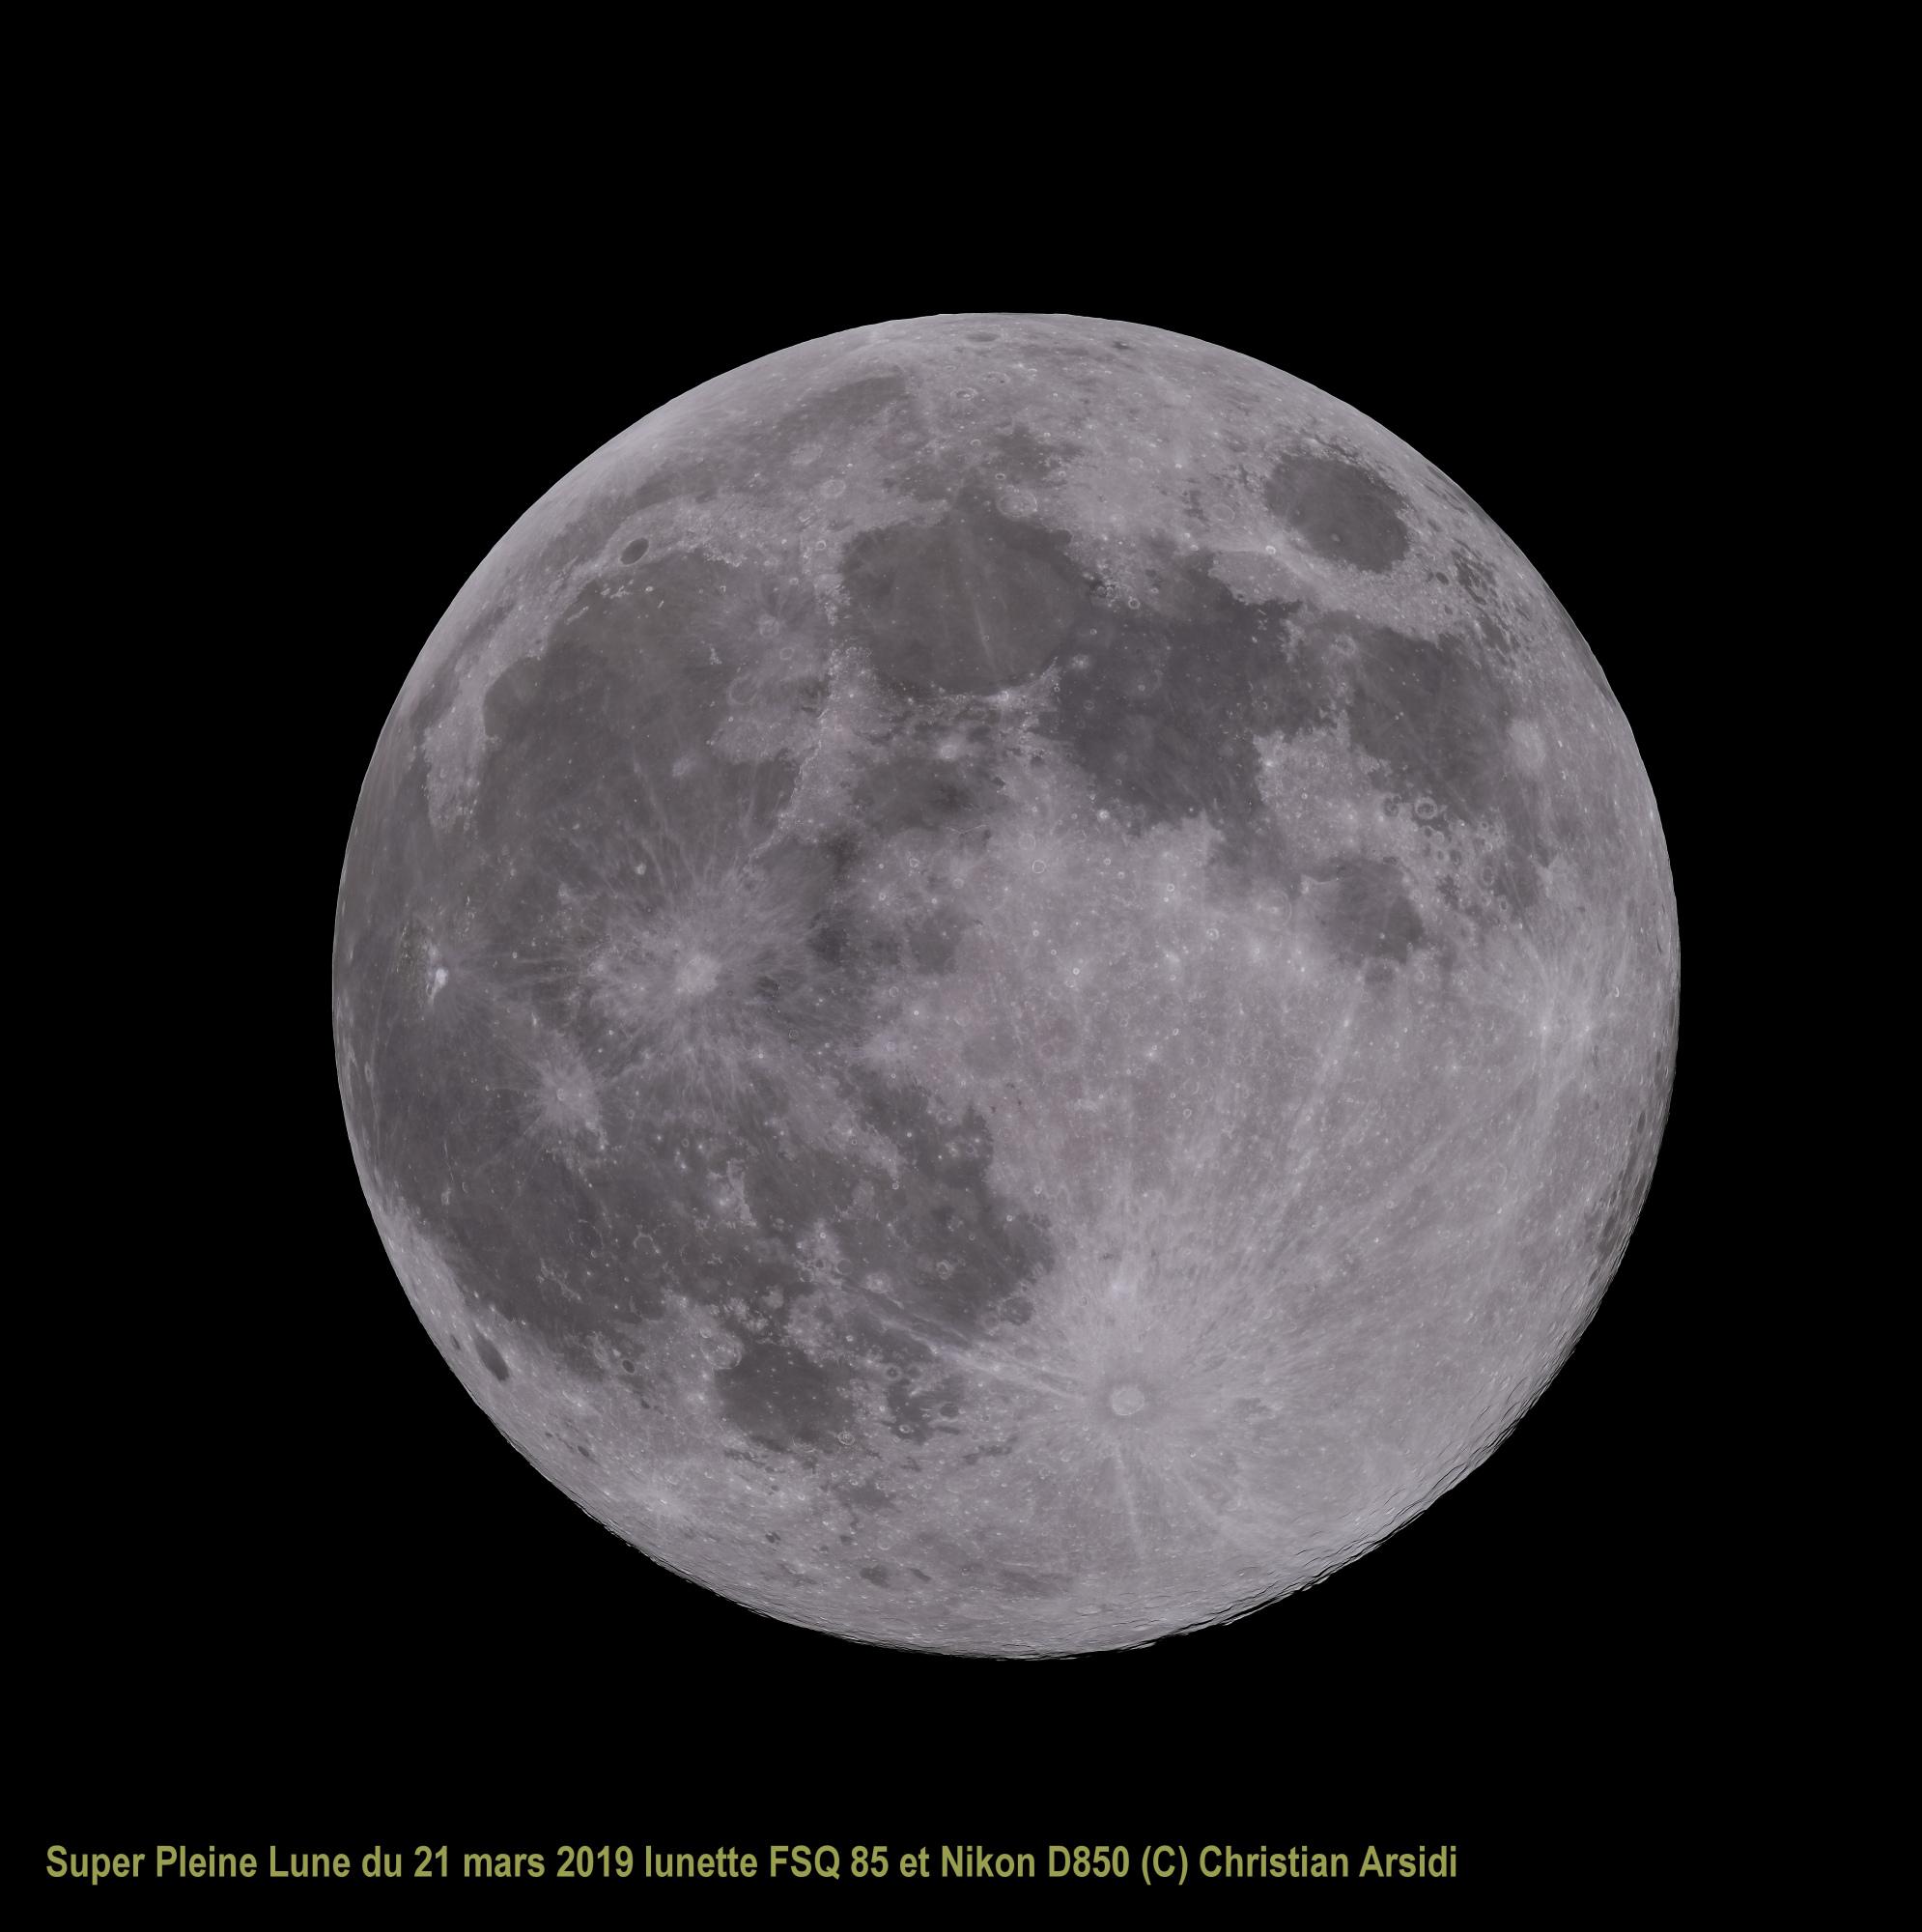 Pleine Lune 45 images recadrée TTB 100% Version 8 JPEG V2.jpg